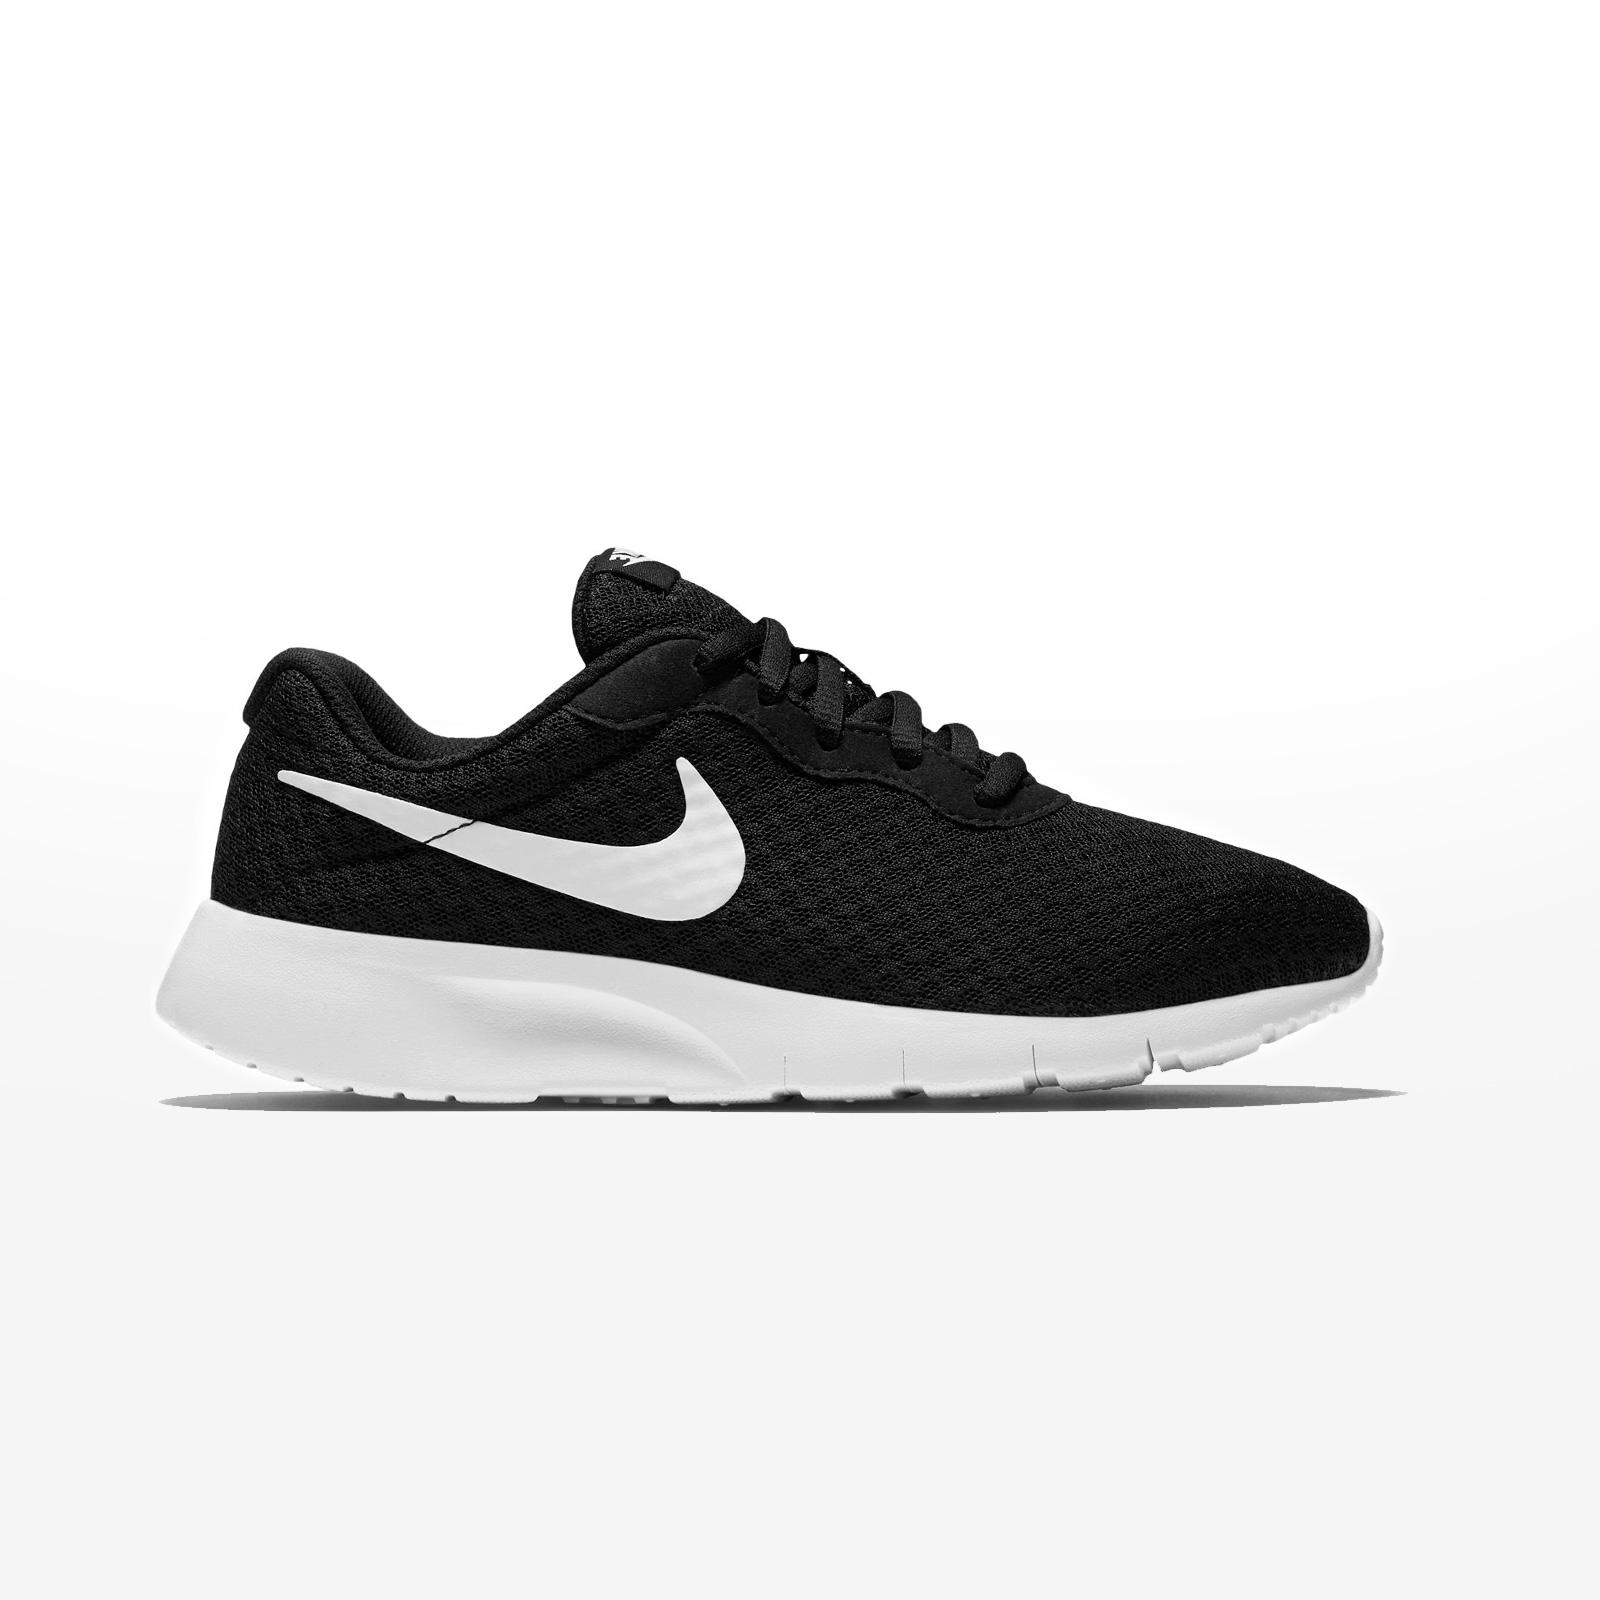 Sportcafe Nike – NIKE TANJUN (GS) – BLACK WHITE-WHITE 1cca241c235